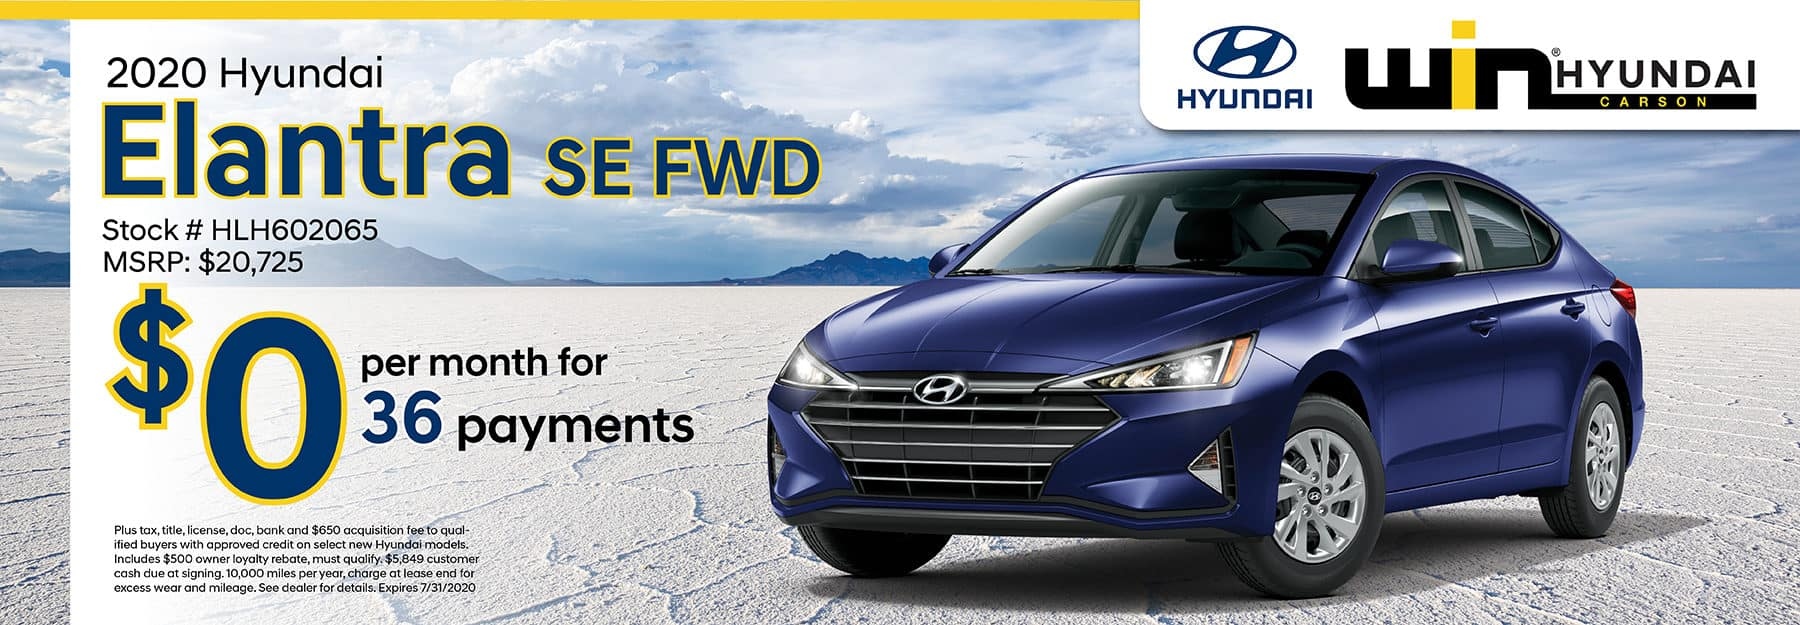 2020 Hyundai Elantra SE FWD